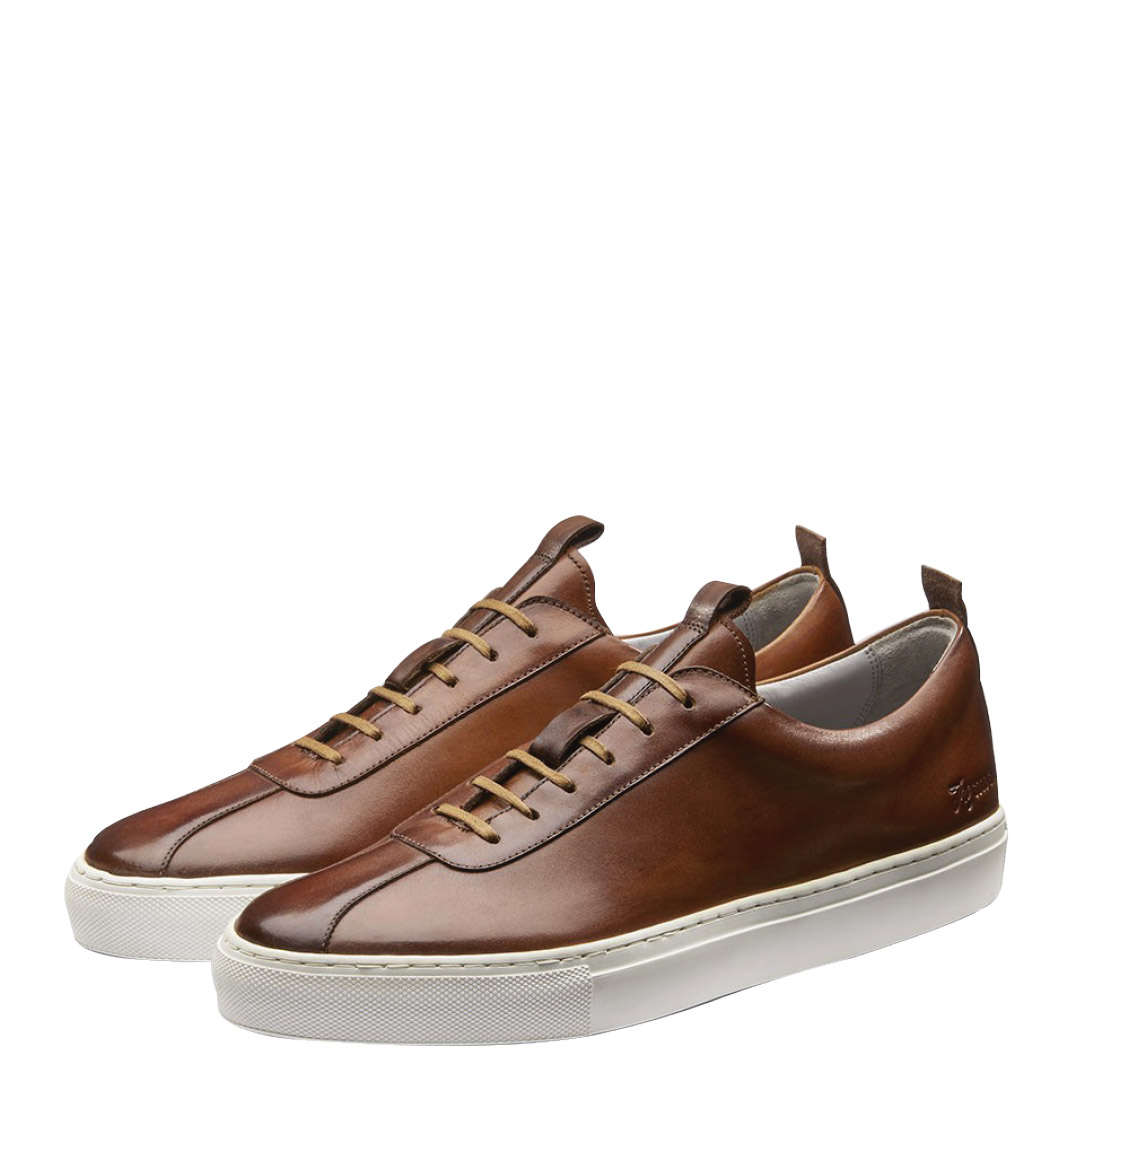 Grenson Tan Leather Oxford Sneaker